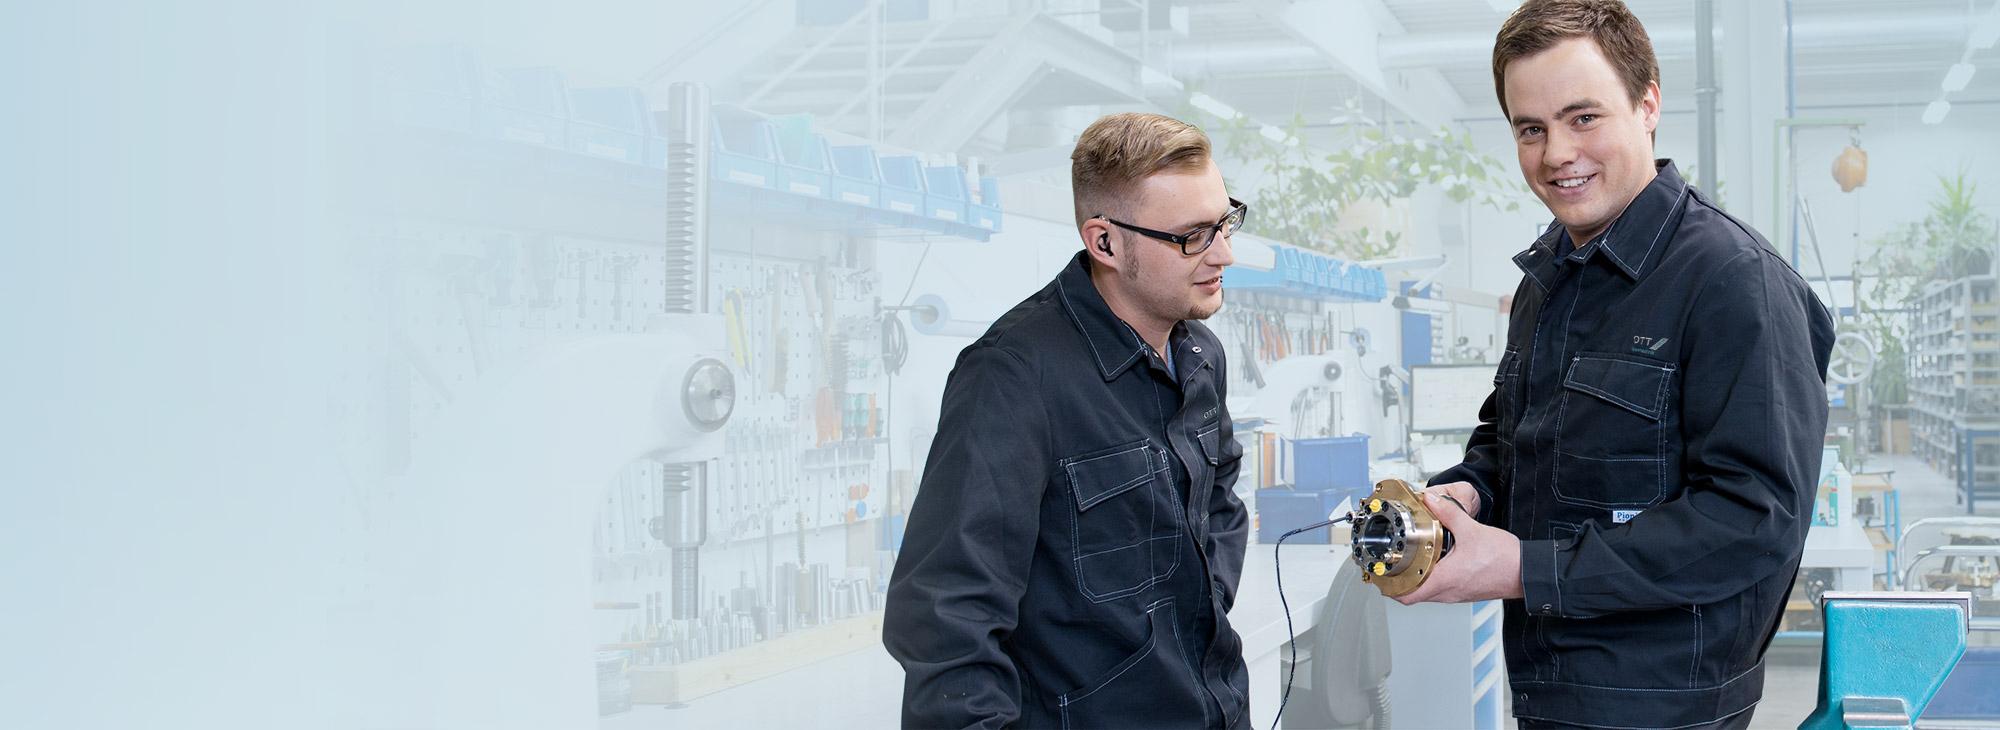 Ott Jakob Service - Header Image